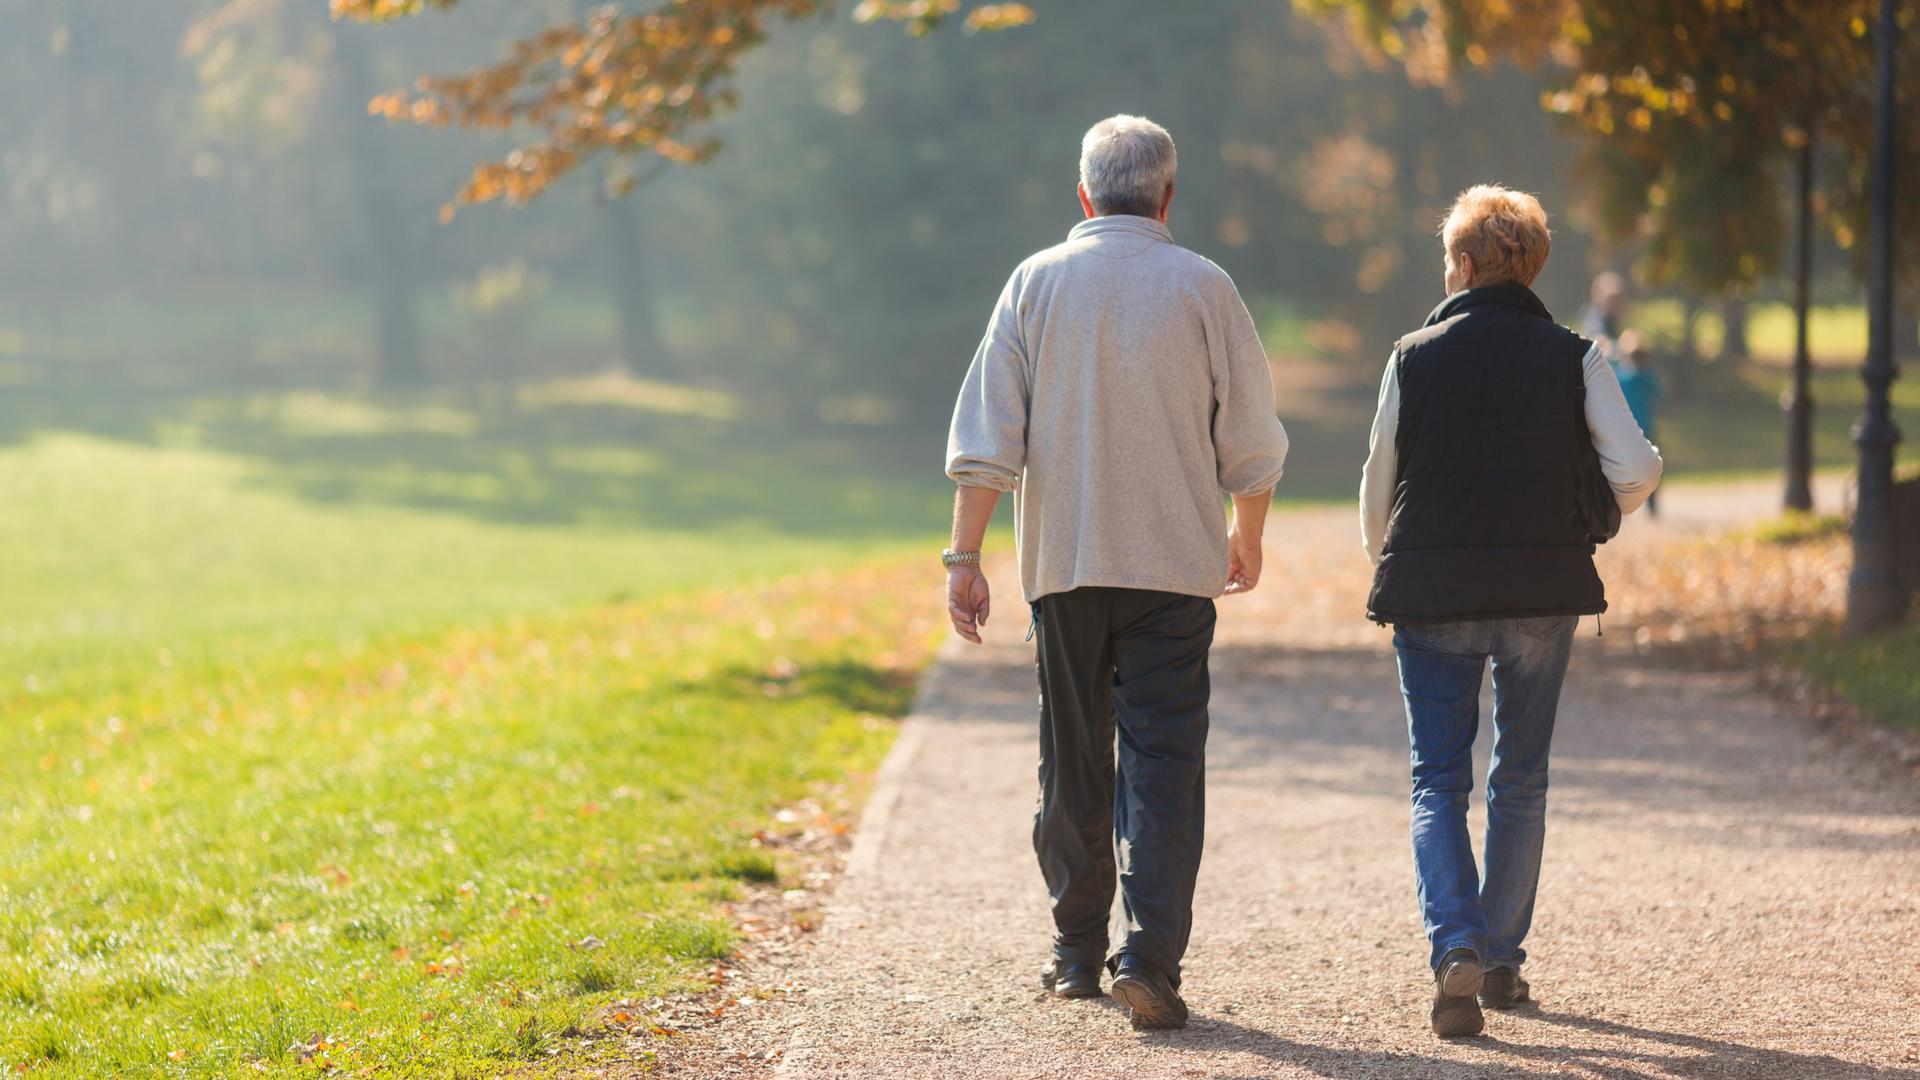 actividad fisica para revenir el cancer